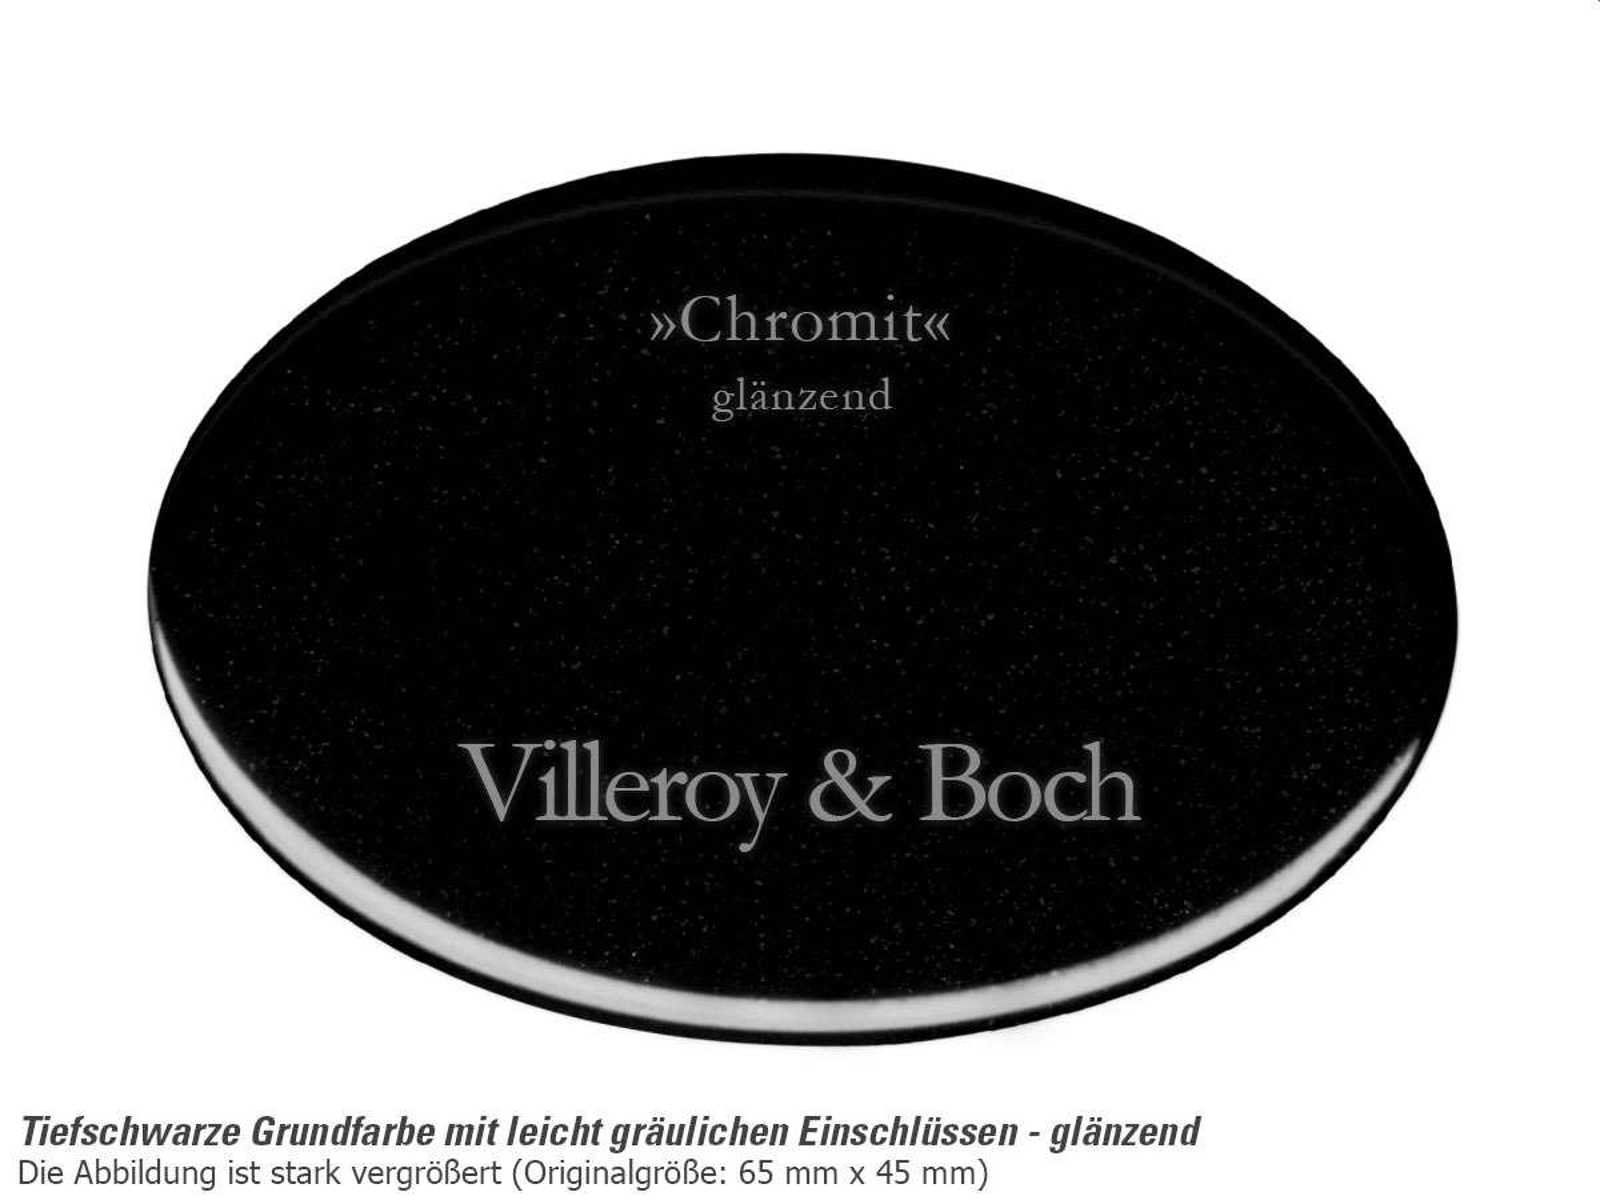 Villeroy & Boch Subway 50 Chromit - 6713 01 J0 Keramikspüle Handbetätigung